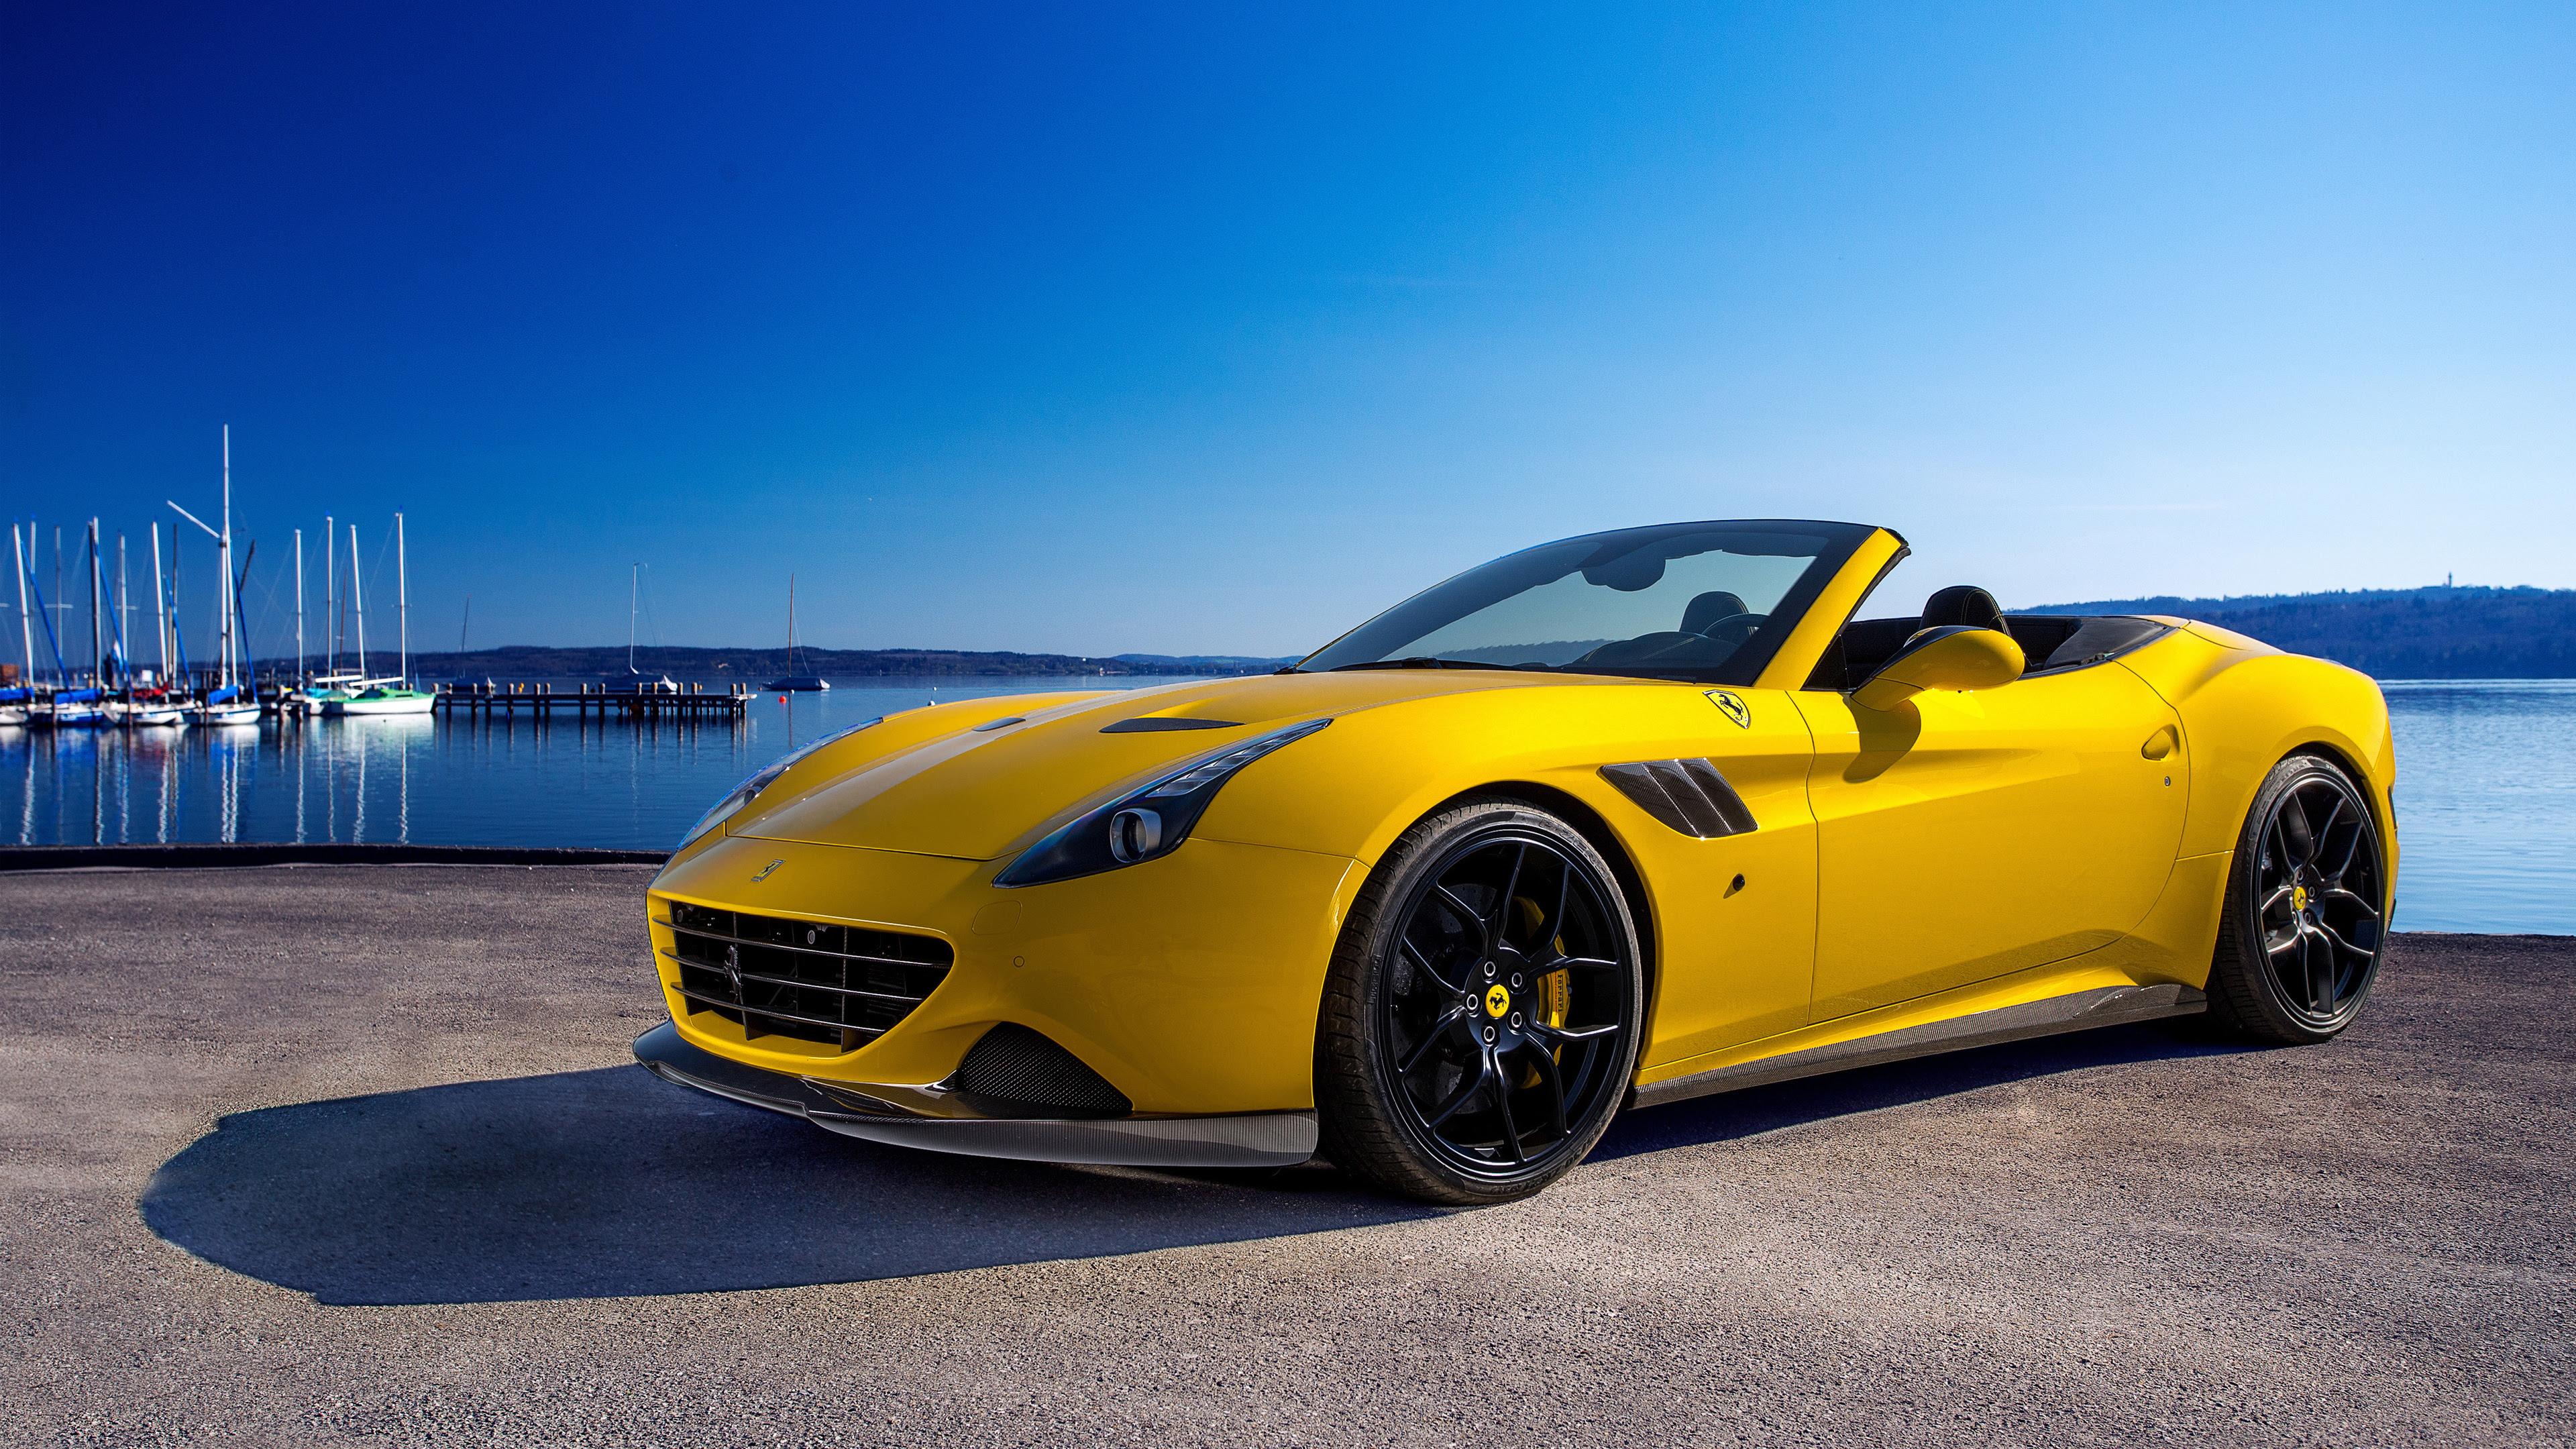 Novitec Rosso Ferrari California T 2015 Wallpaper | HD Car ...